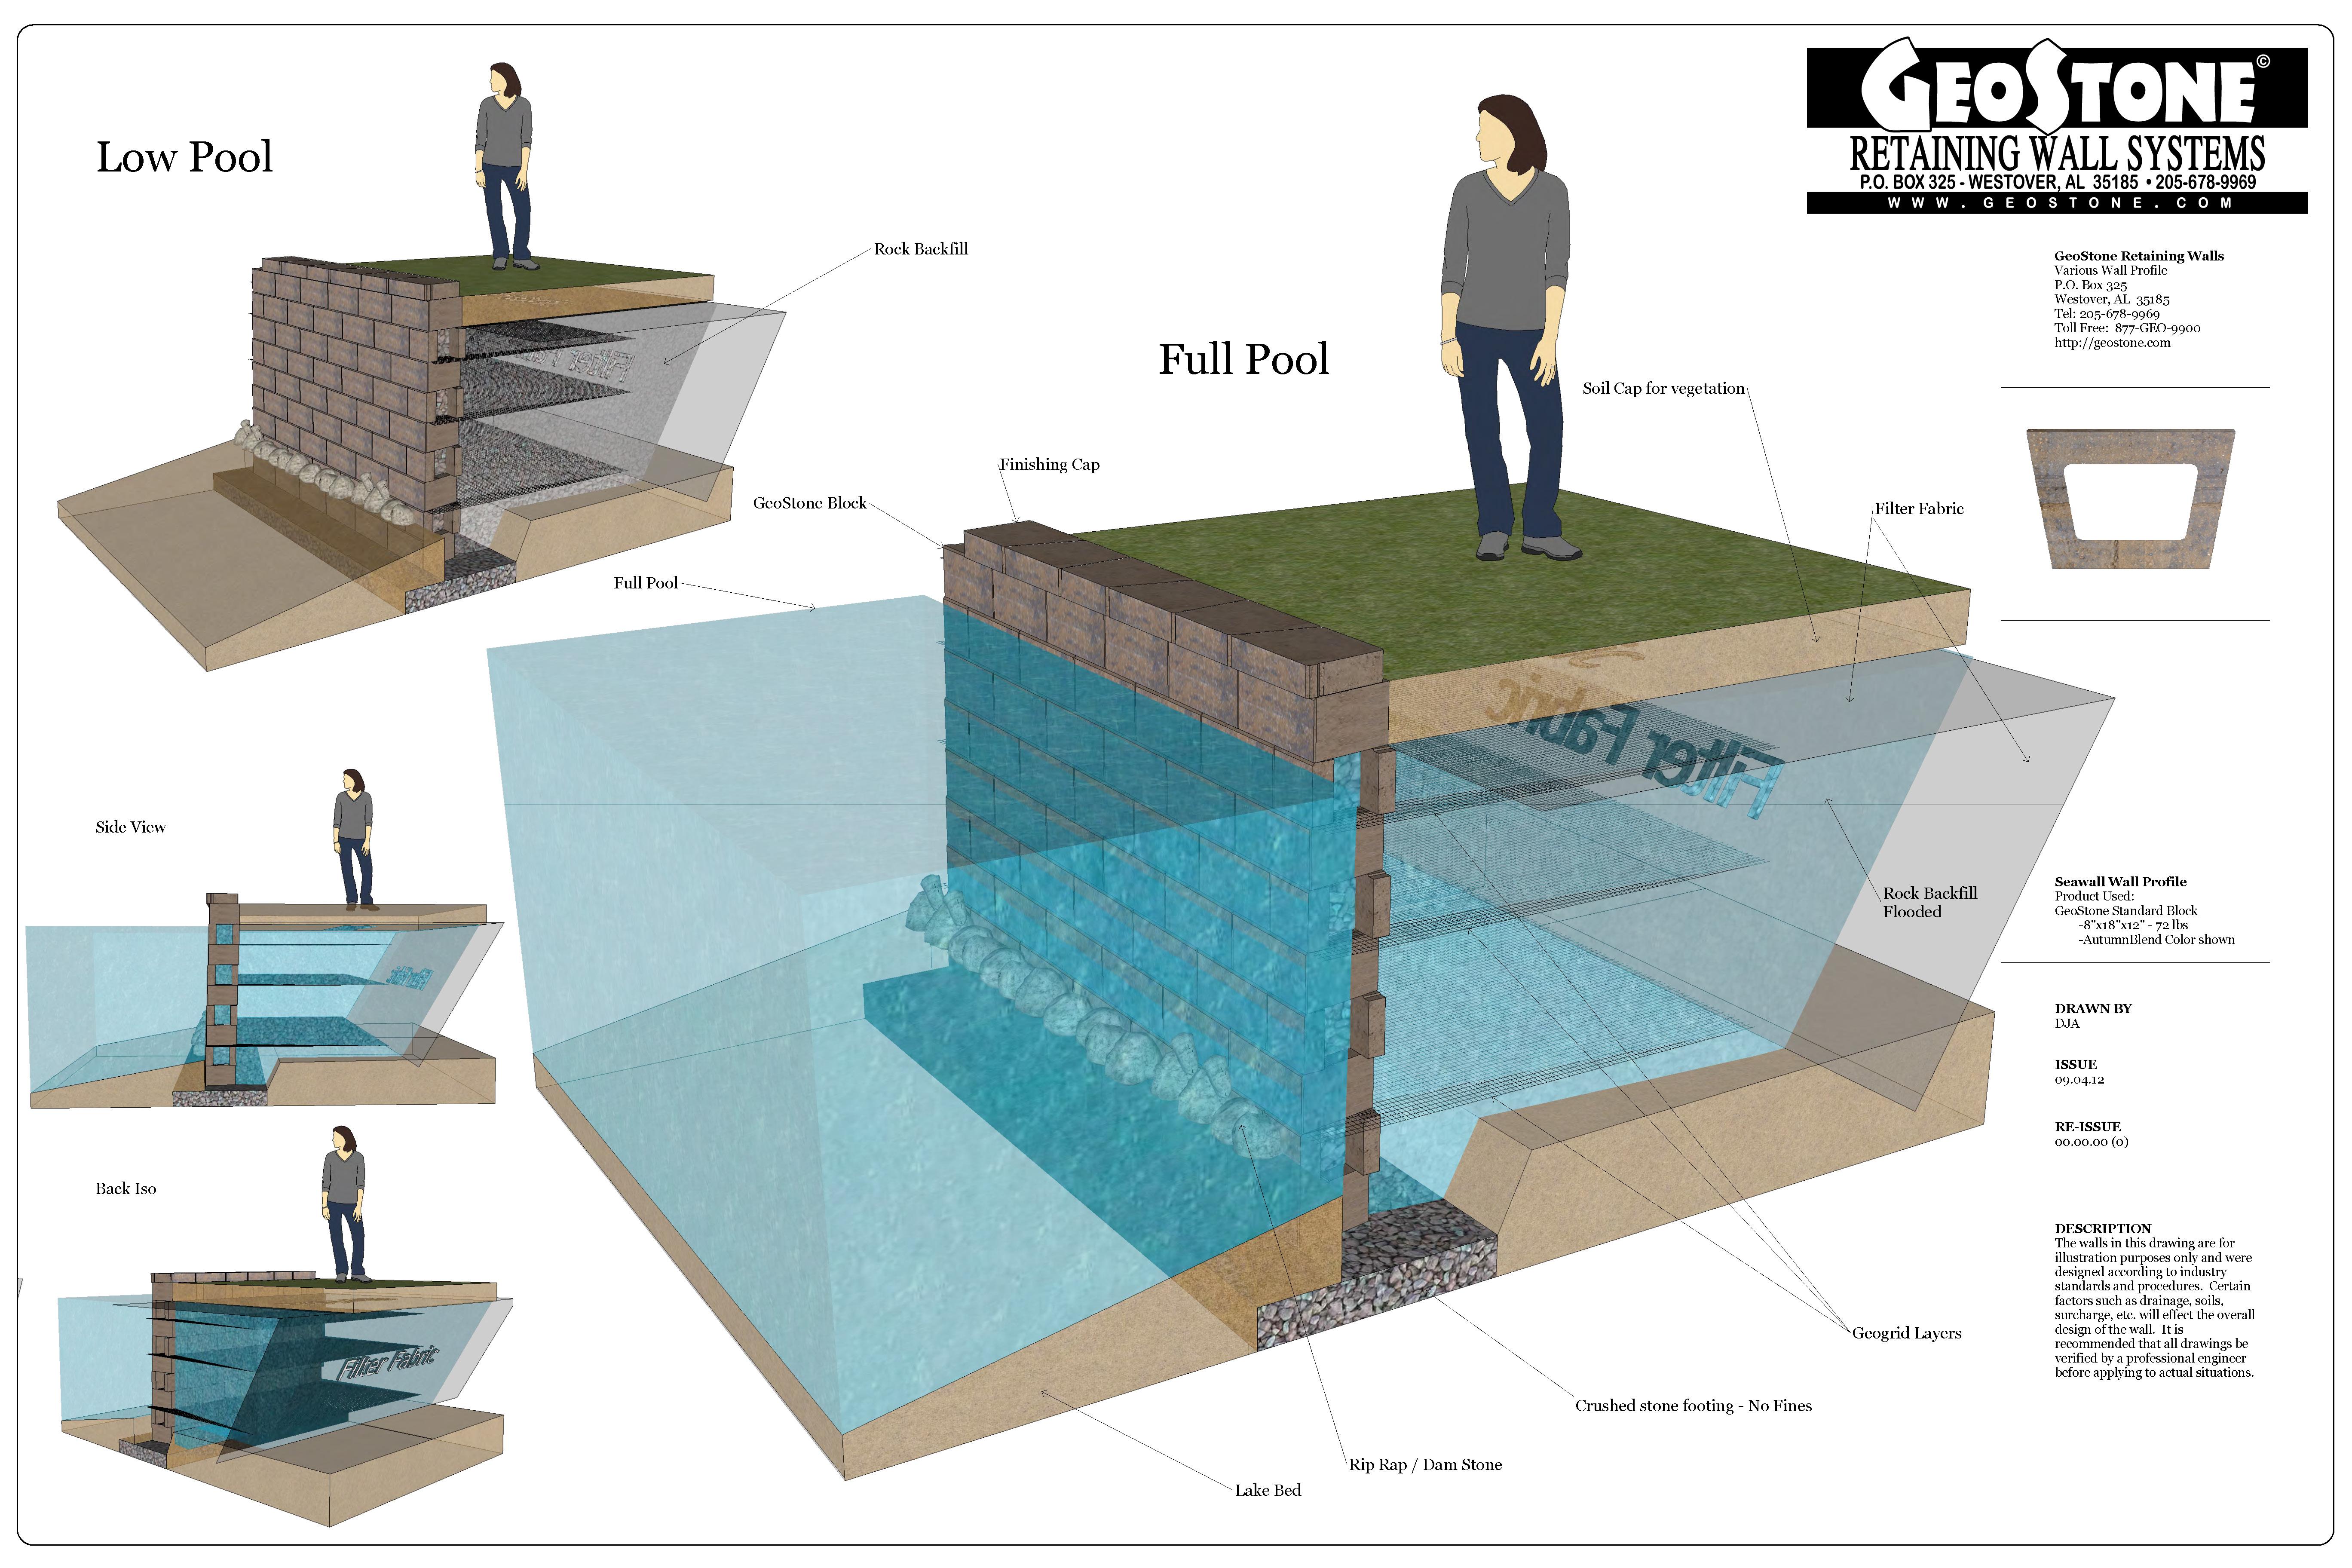 Small Garden Pictures Open Core Geostone Modular Retaining Walls